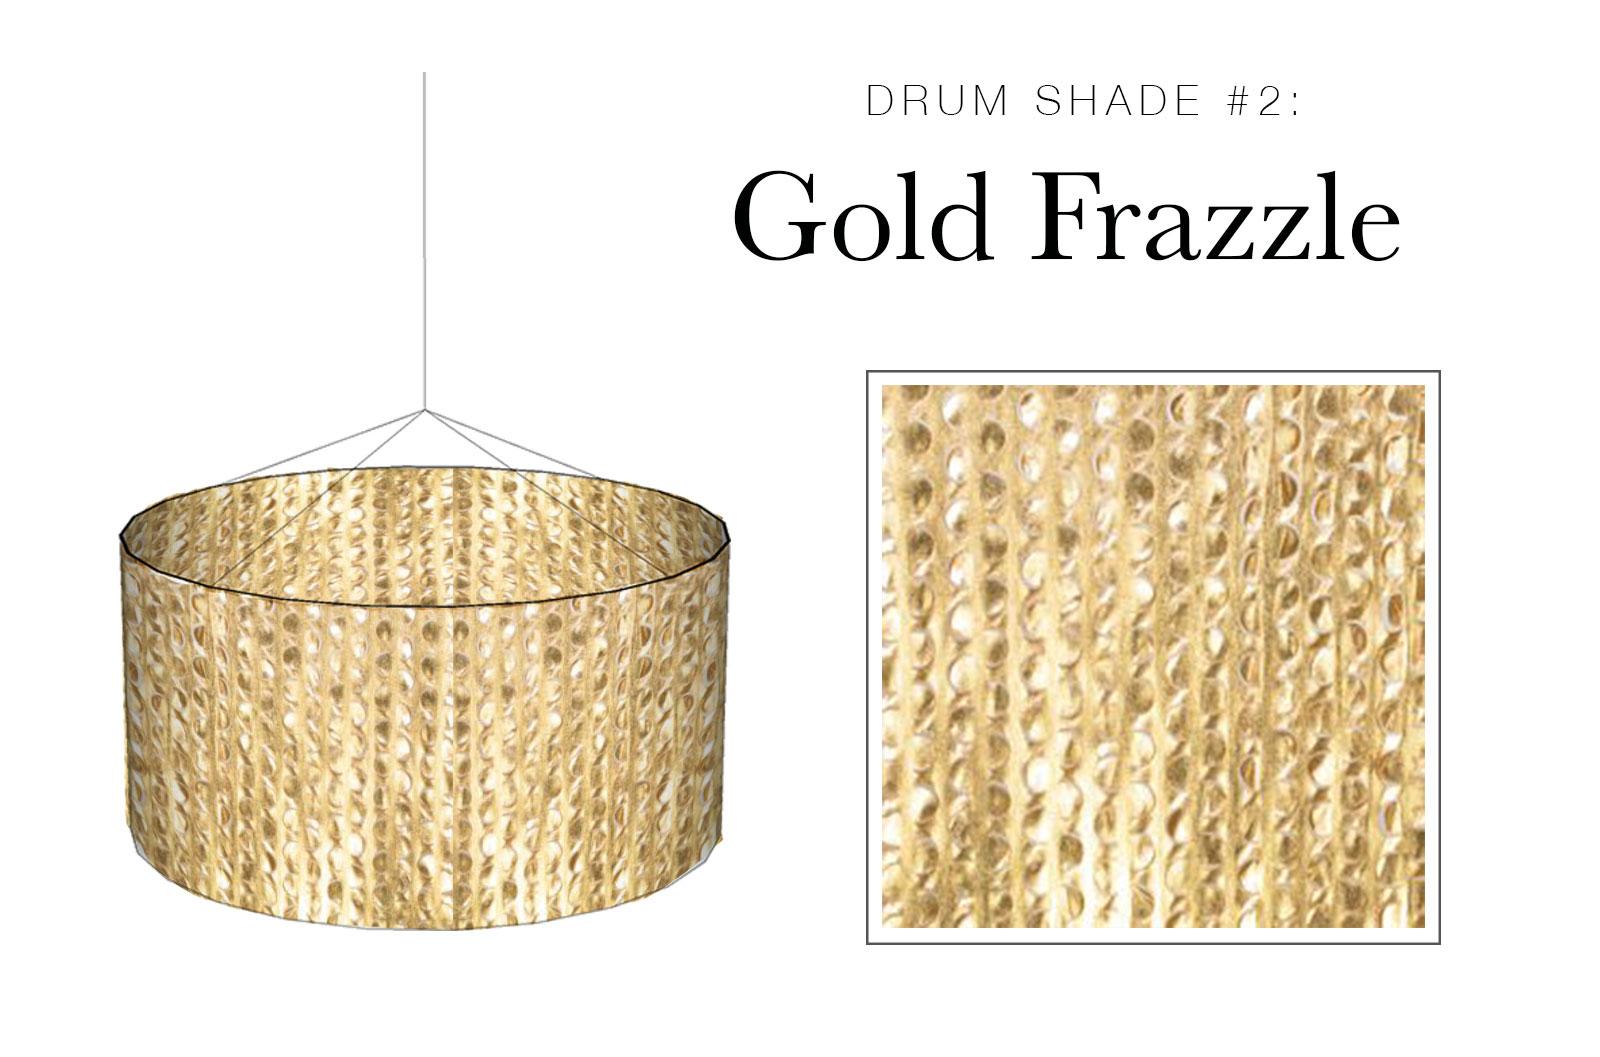 Drum Shade #2: Gold Frazzle